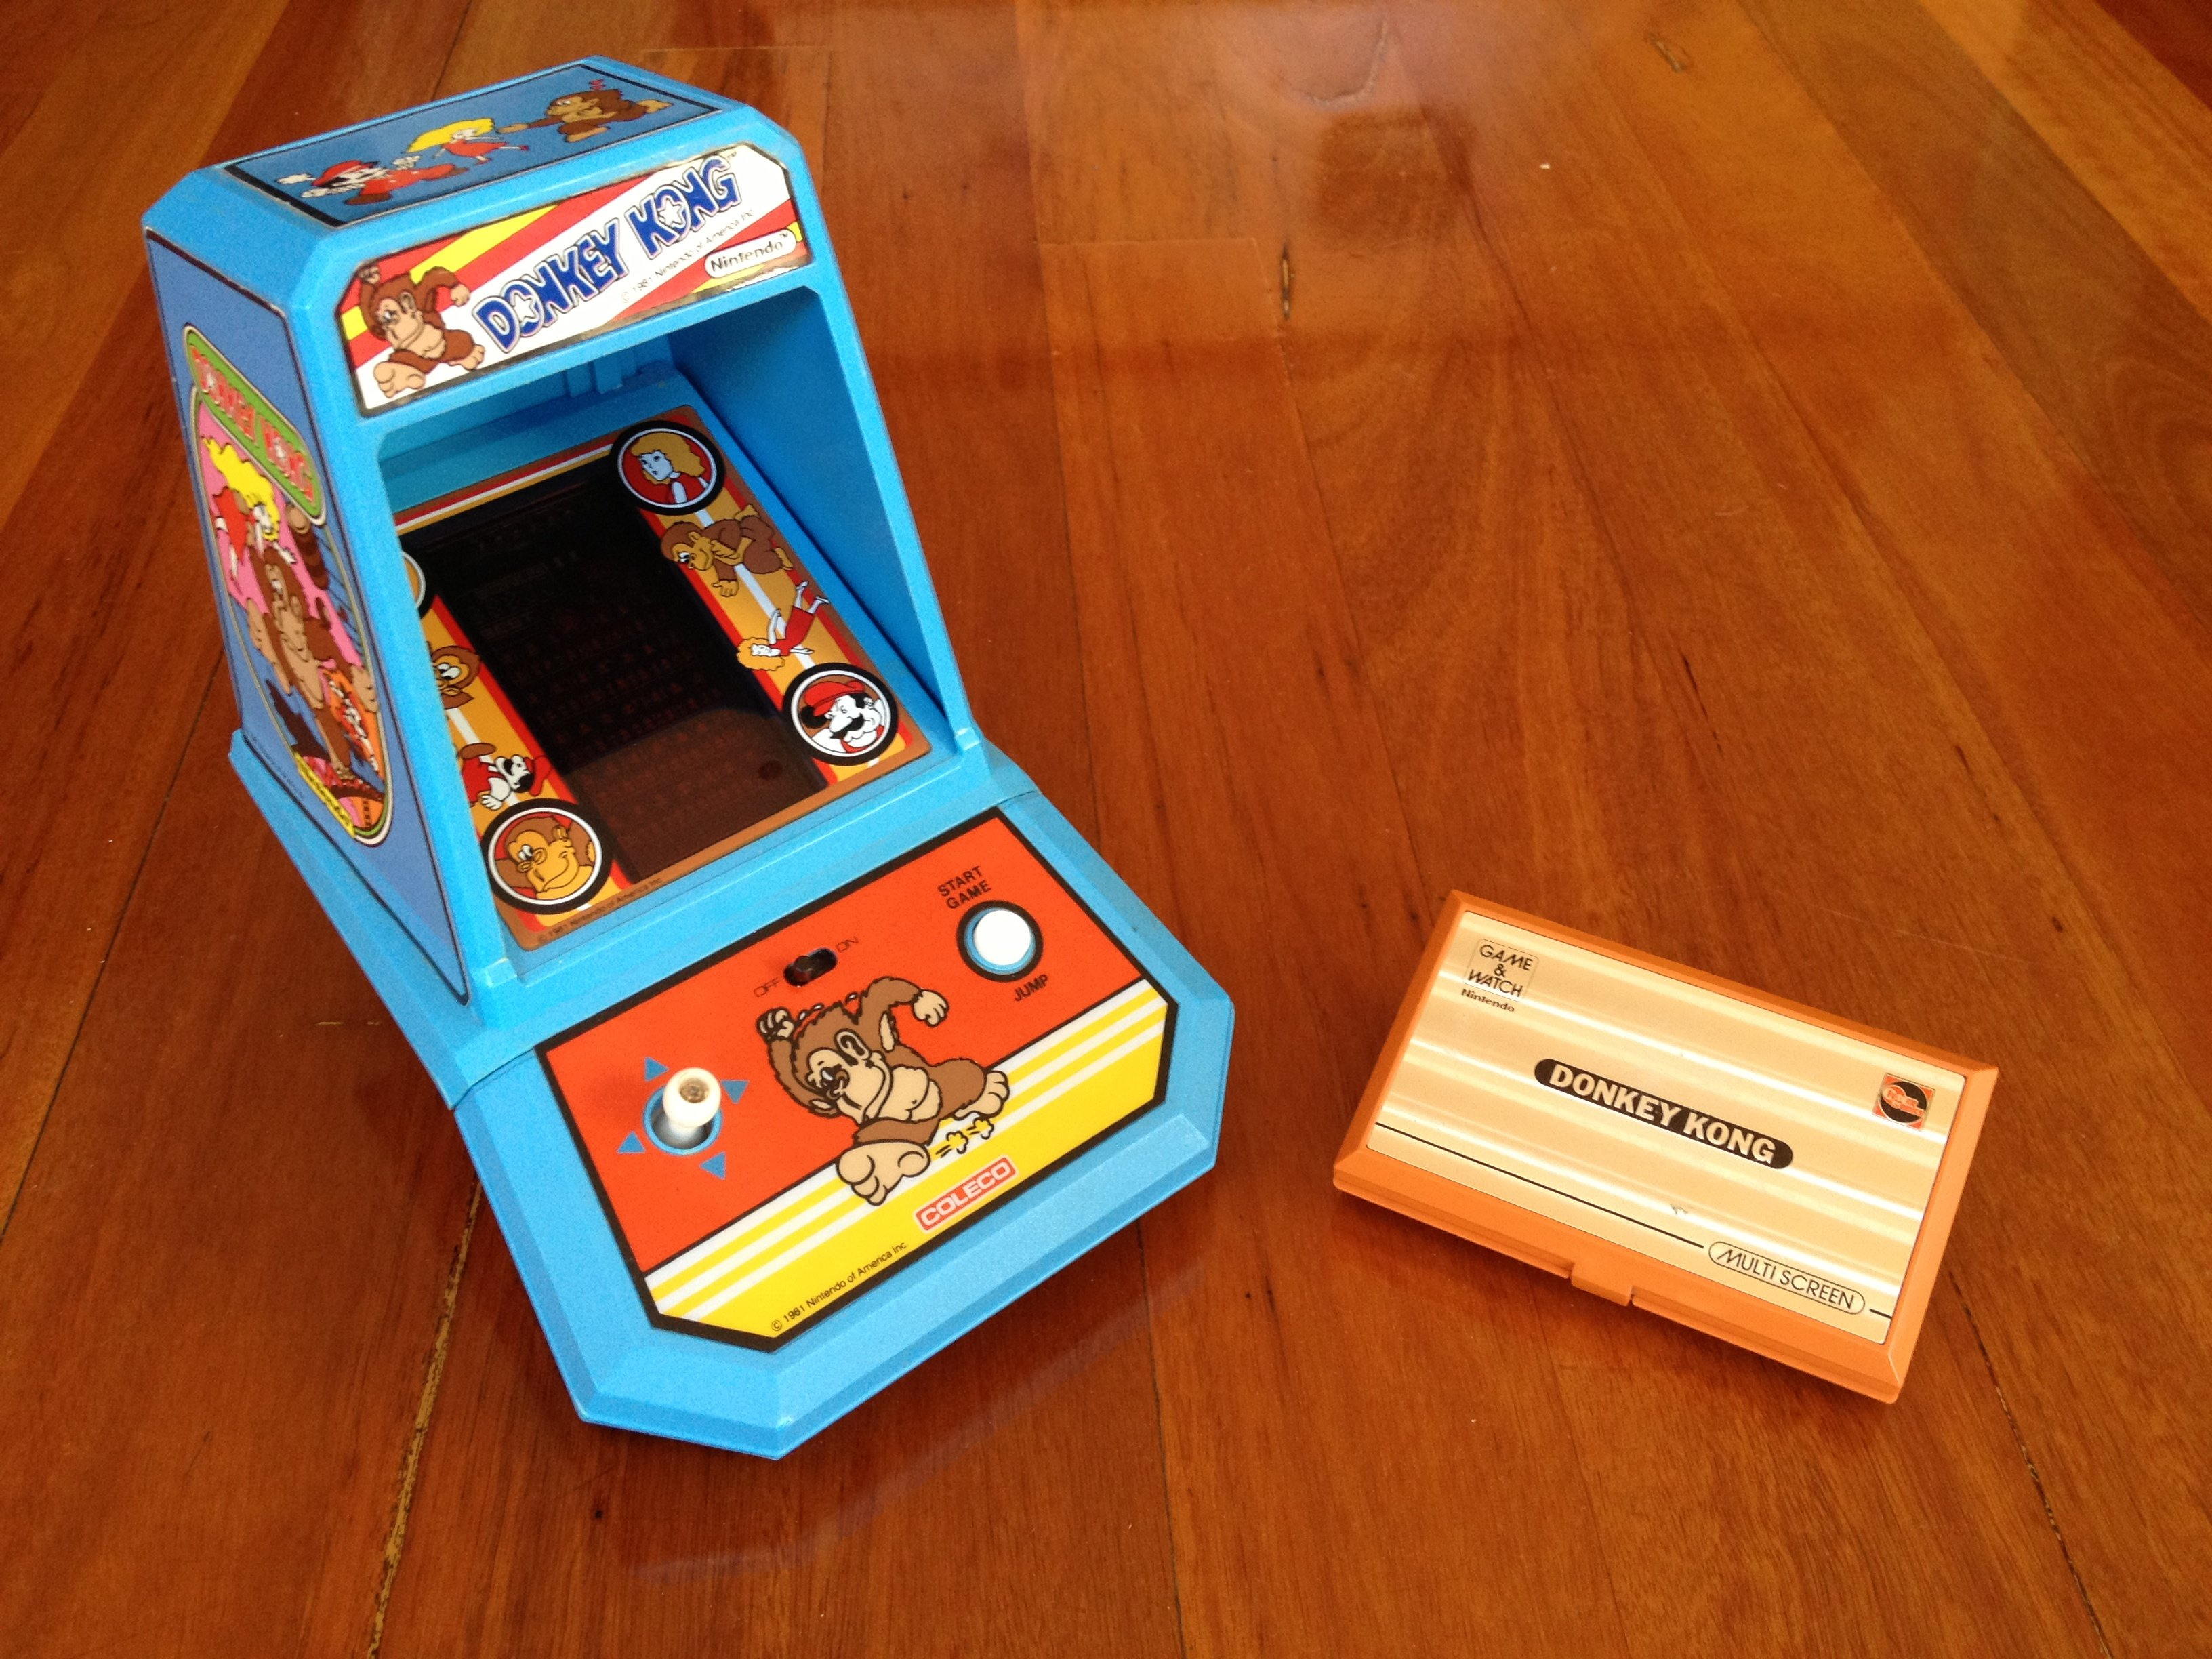 Feature: Nintendo Battle - Donkey Kong: Tabletop vs. Game & Watch